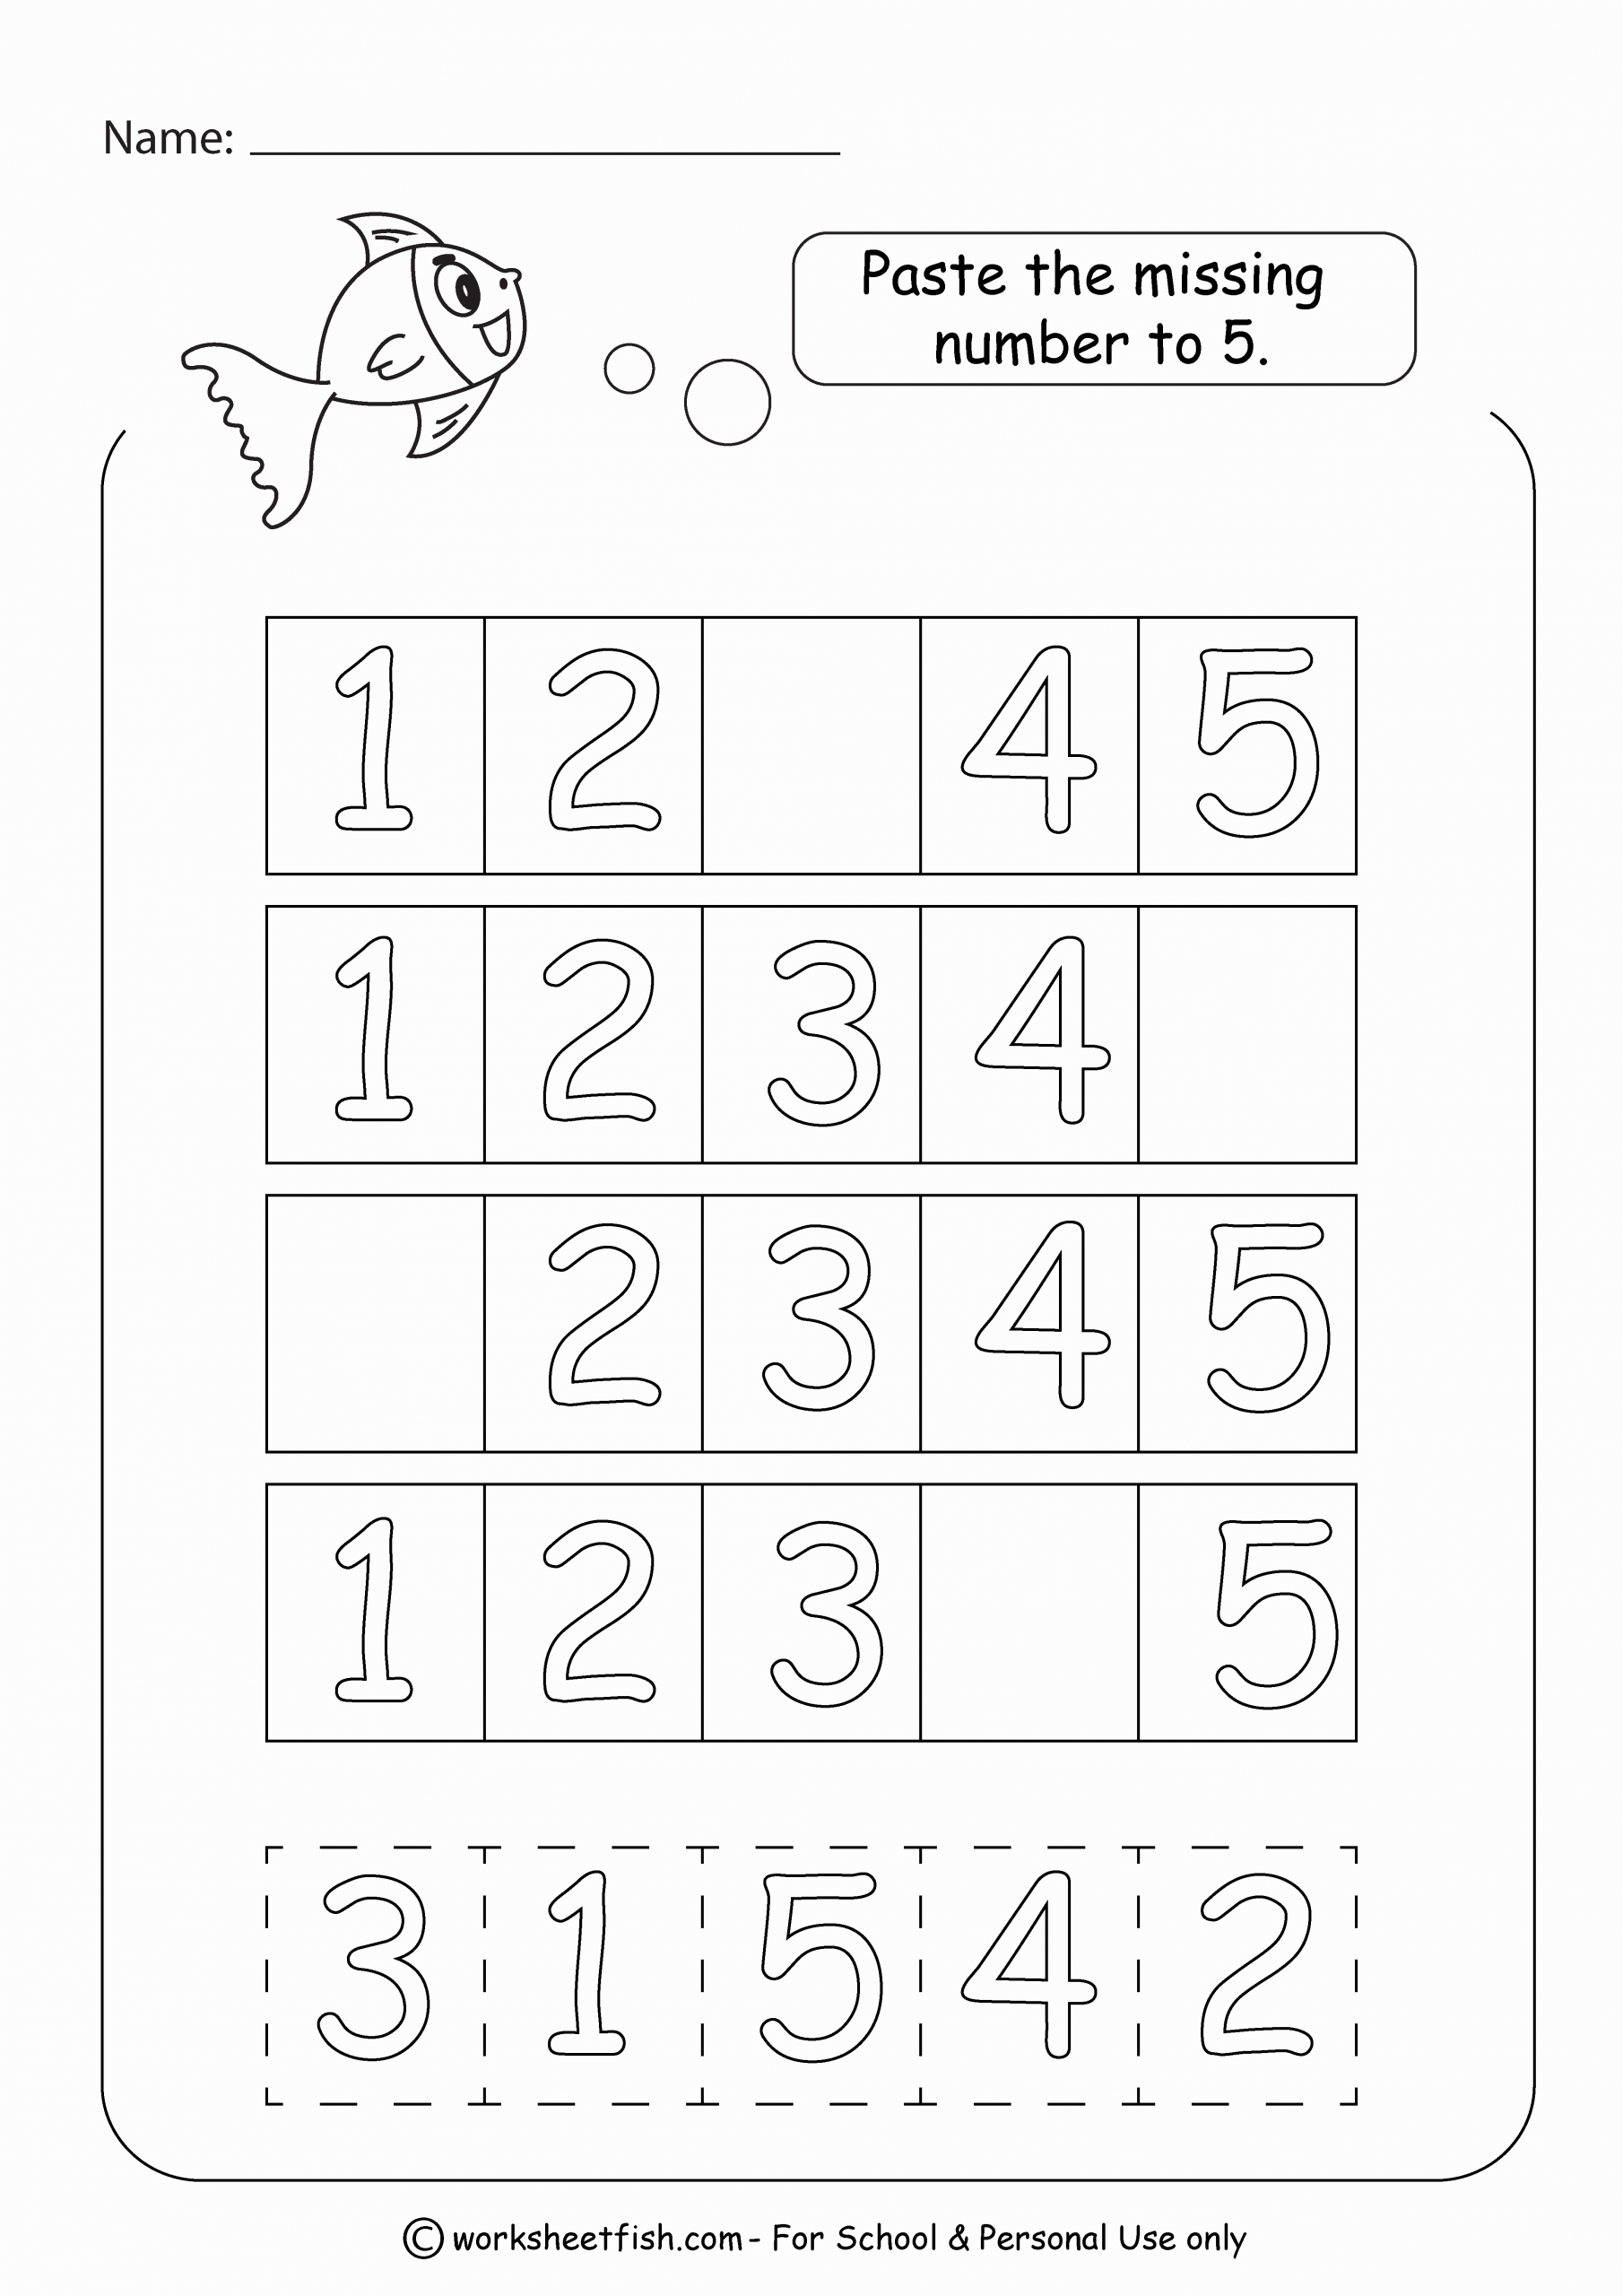 Missing Number Worksheets 1 20 Elegant Missing Numbers 1 20 Cut and Paste Worksheets Worksheet Fish